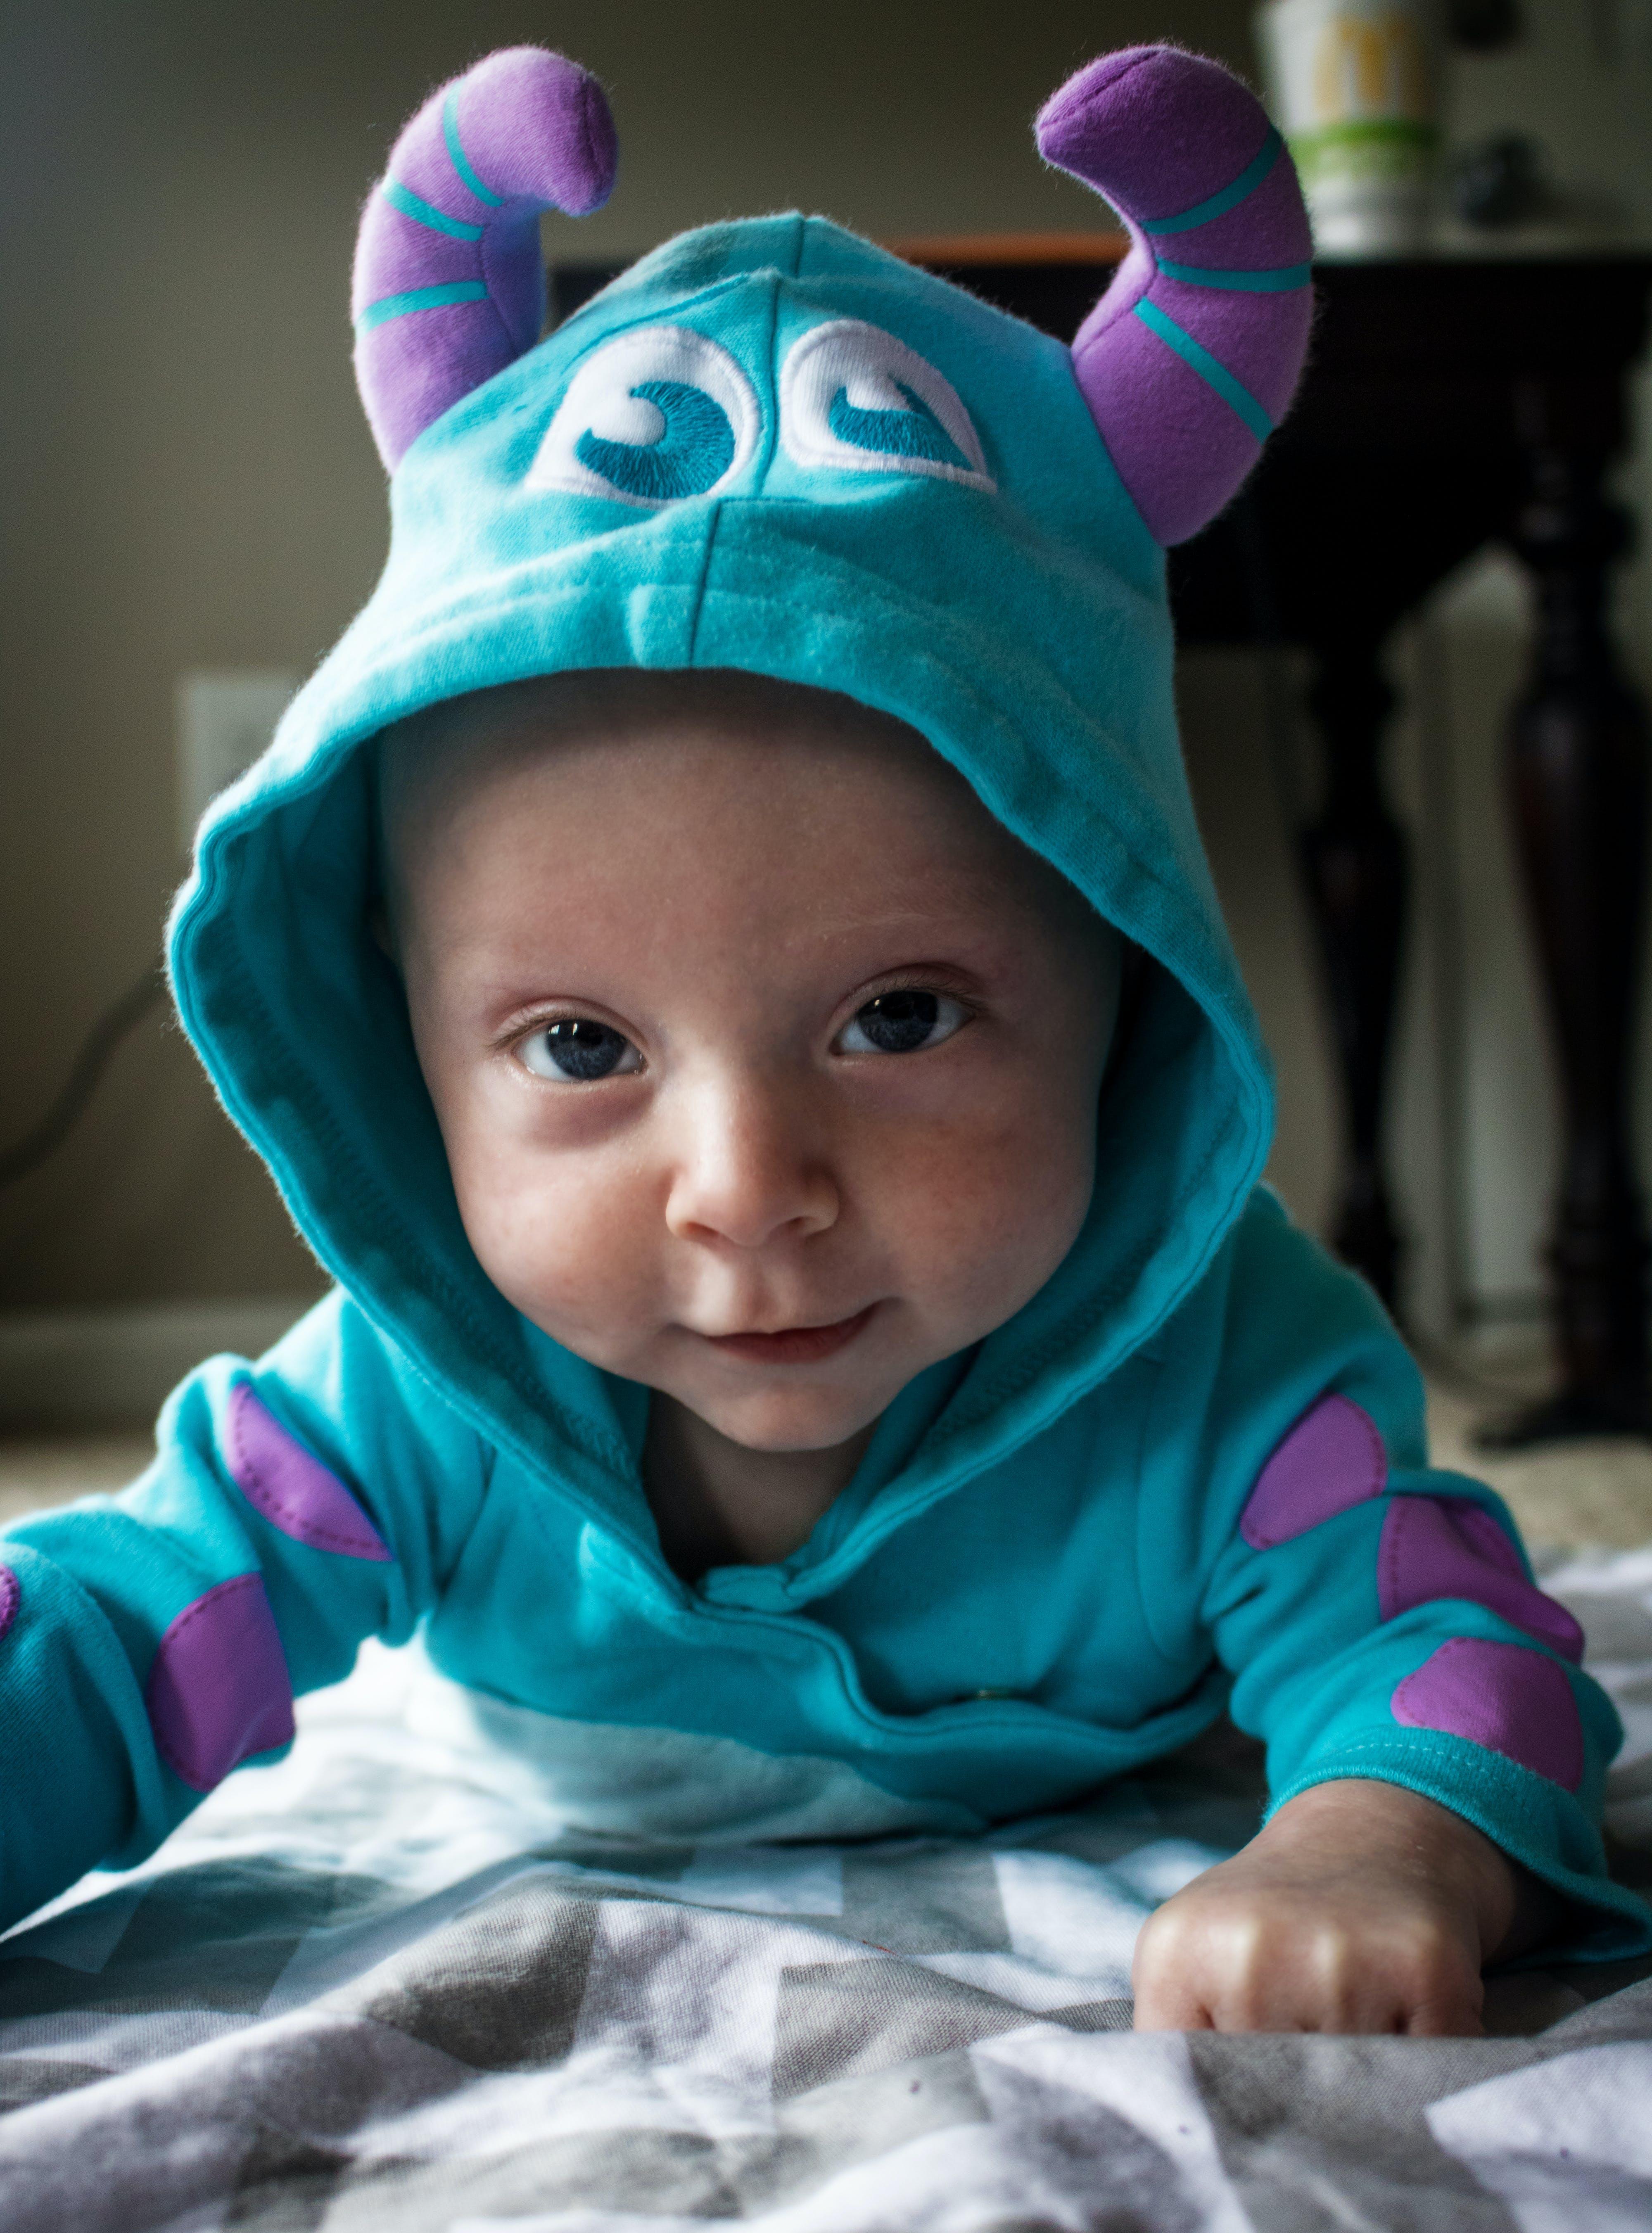 Free stock photo of baby, baby model, boy, cute